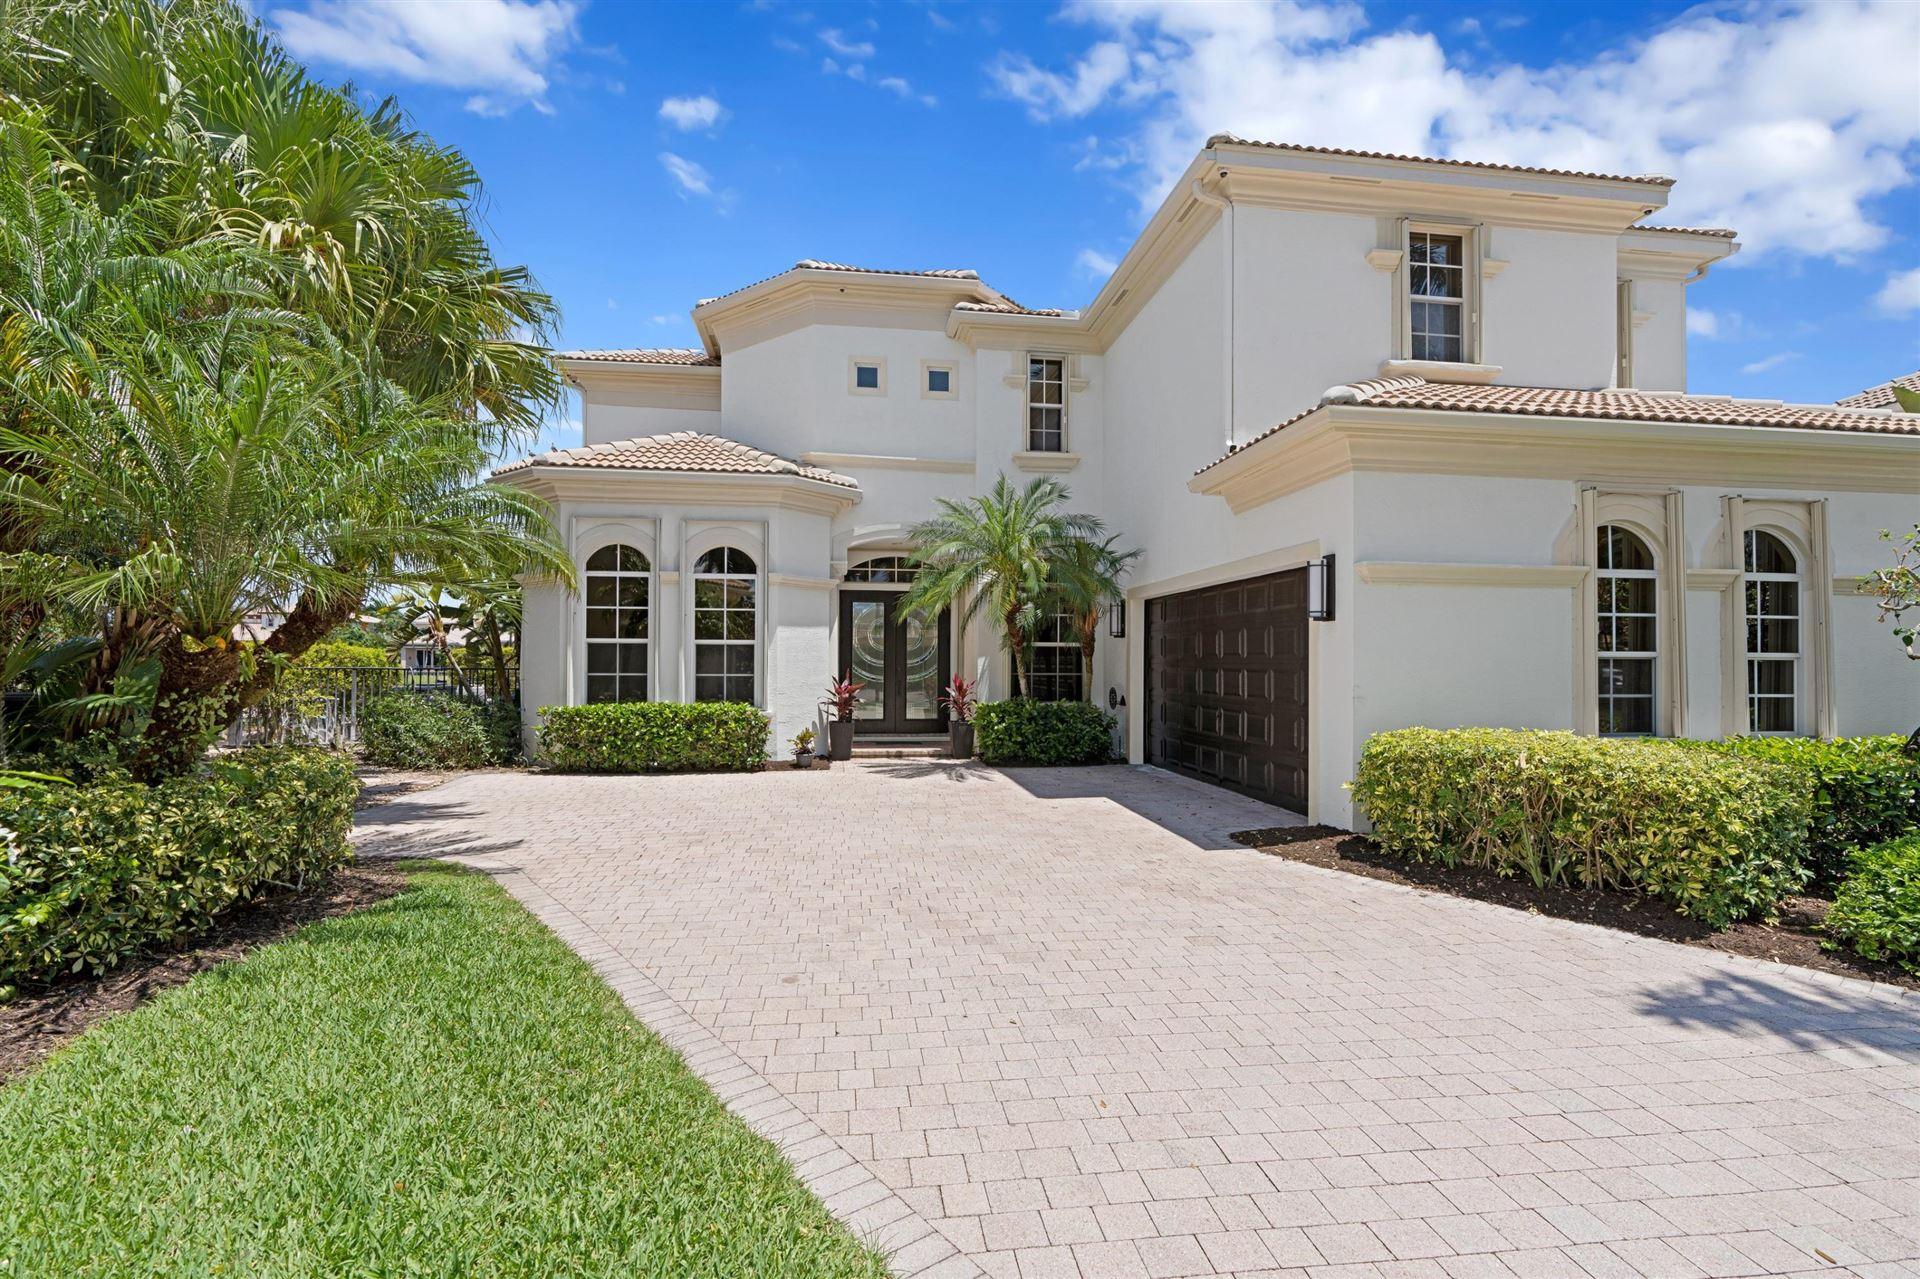 Photo of 355 Vizcaya Drive, Palm Beach Gardens, FL 33418 (MLS # RX-10713868)